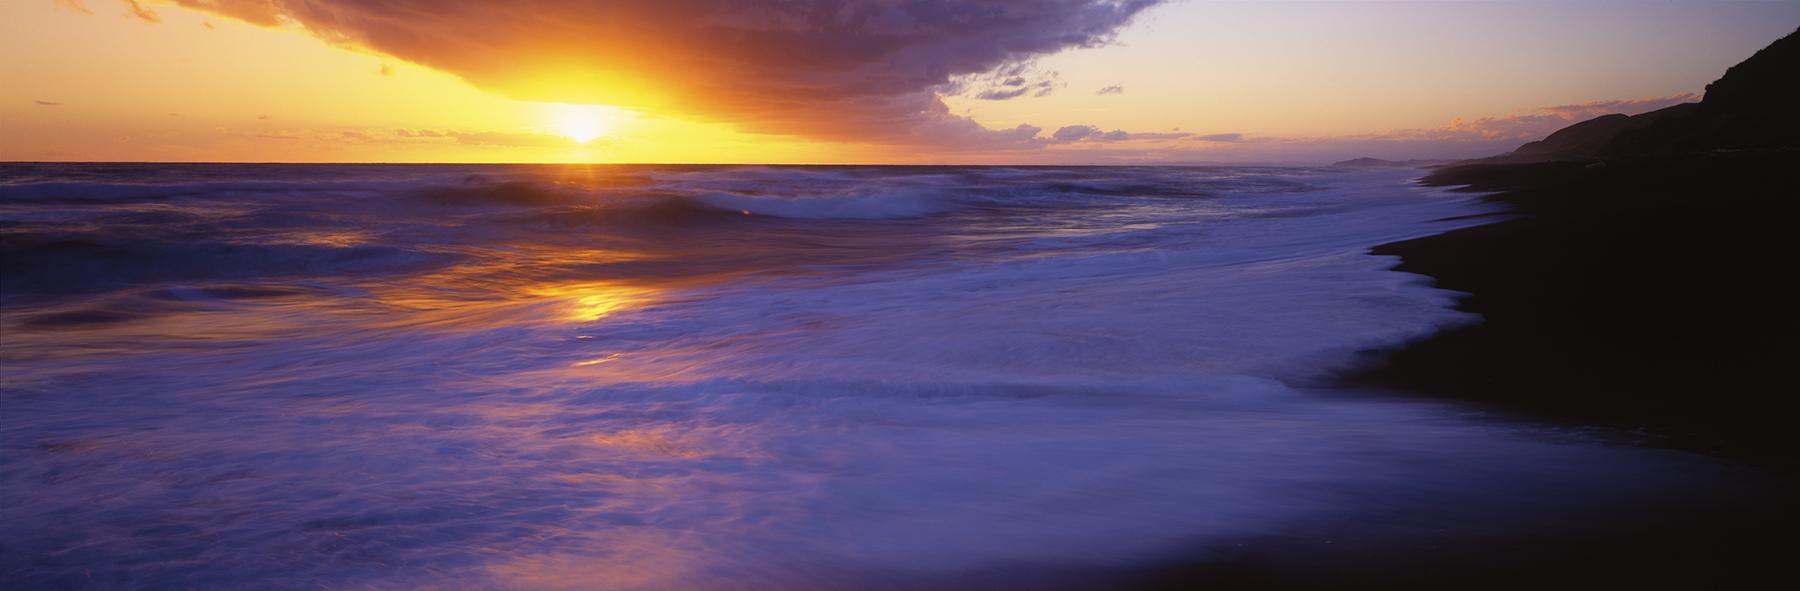 Mahia Peninsula, New Zealand. A Limited Edition Fine Art Landscape Photograph by Richard Hume